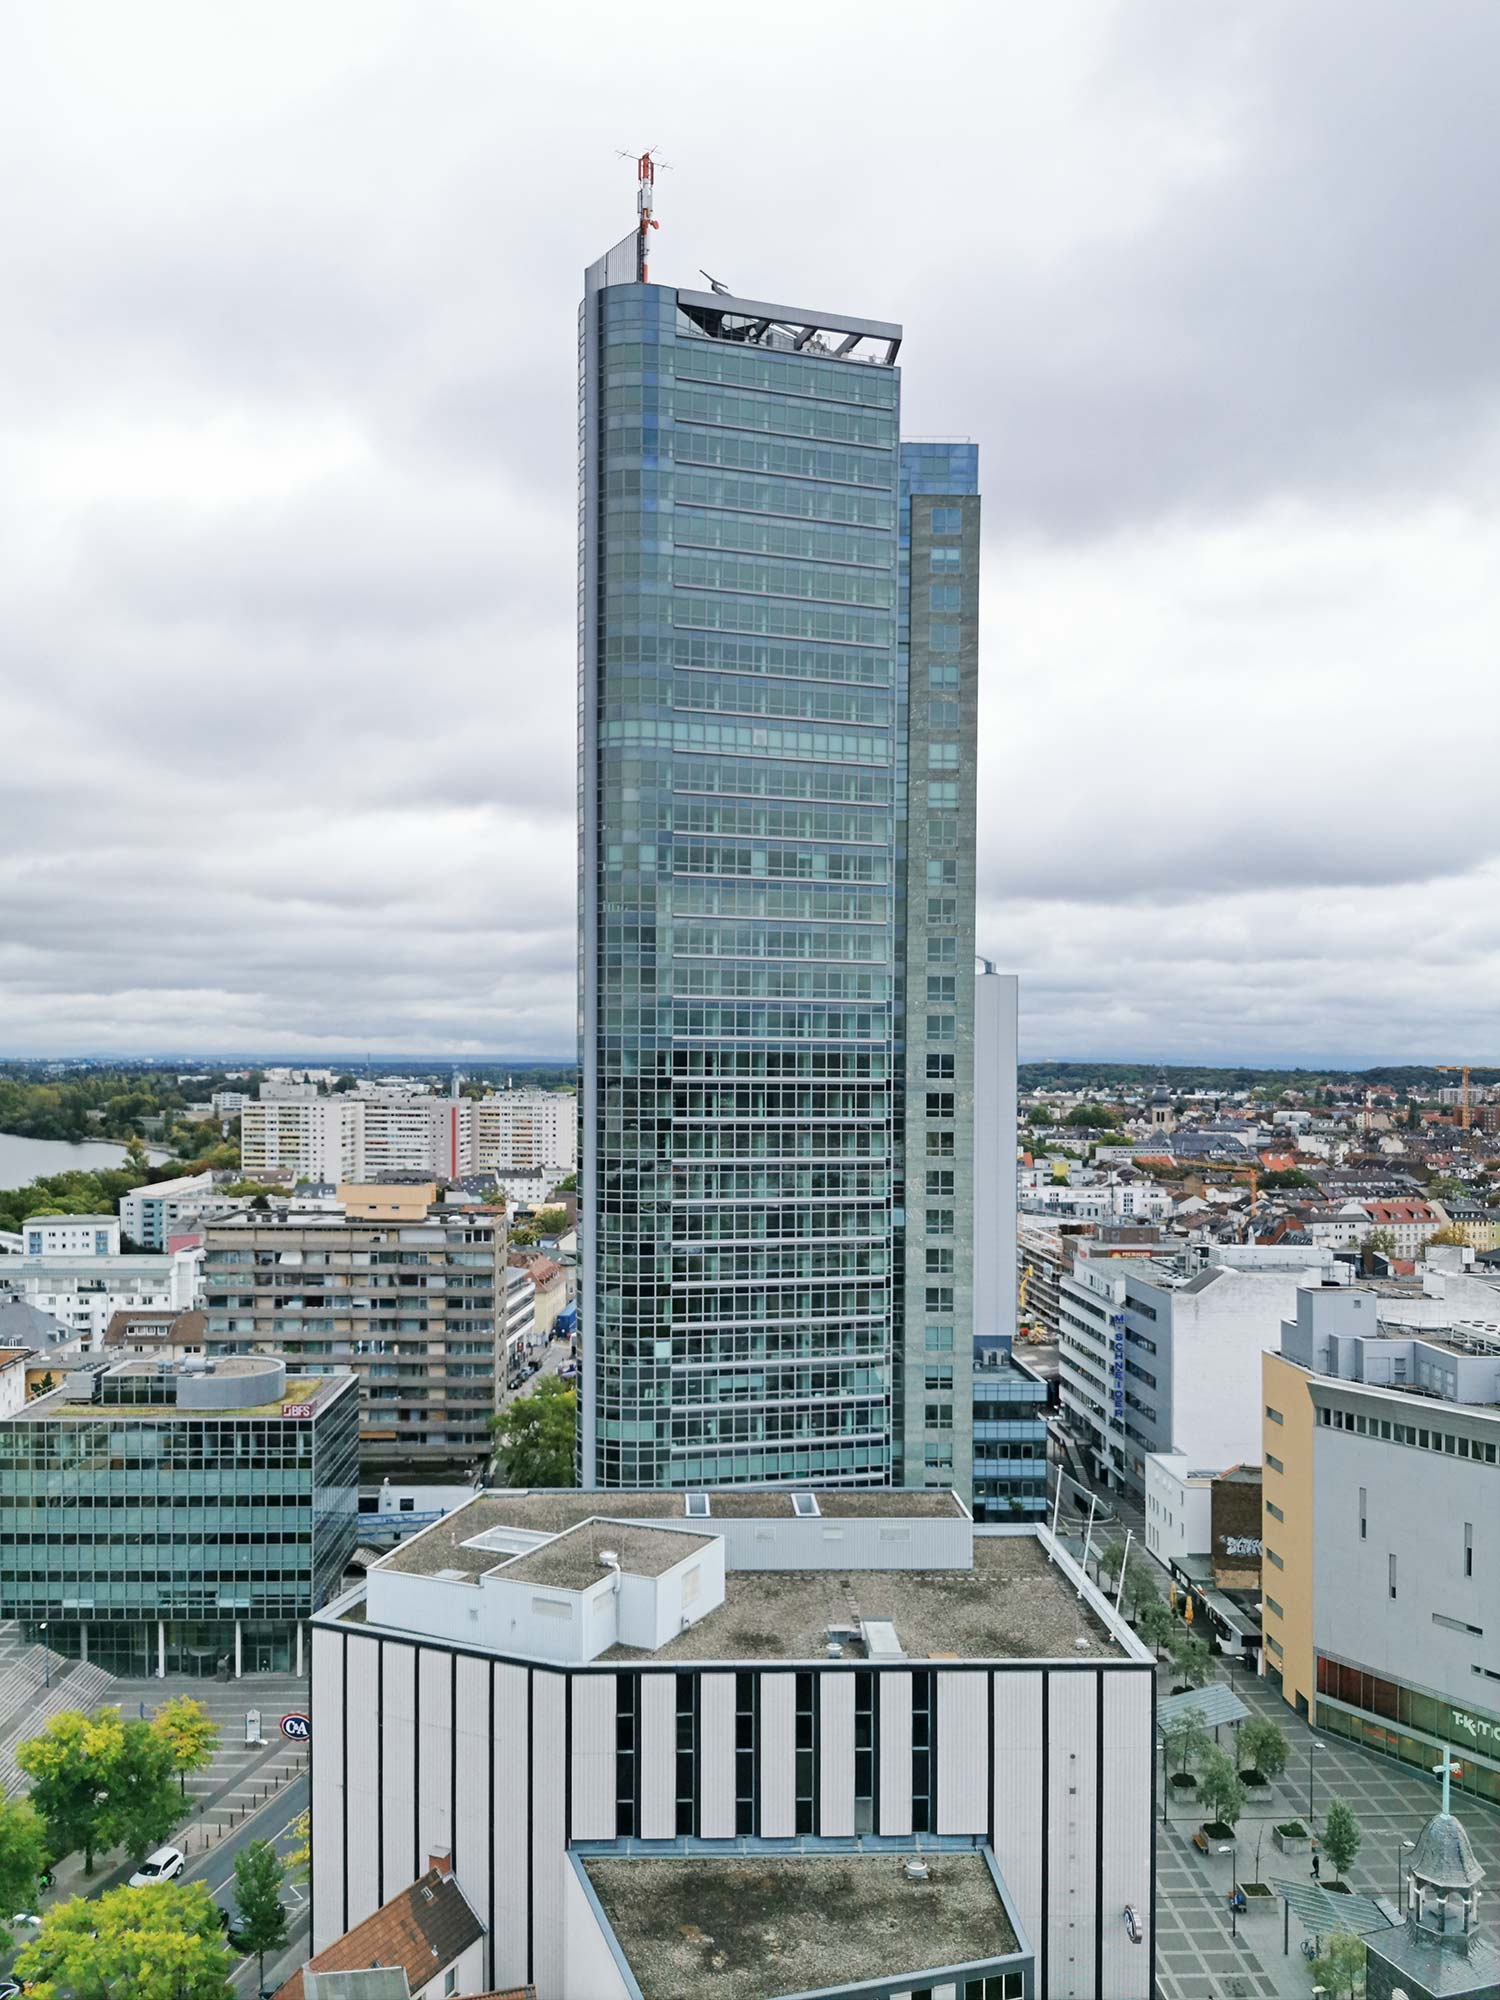 Offenbach City Tower - Bürohochhaus Citytower OF - Berliner Straße